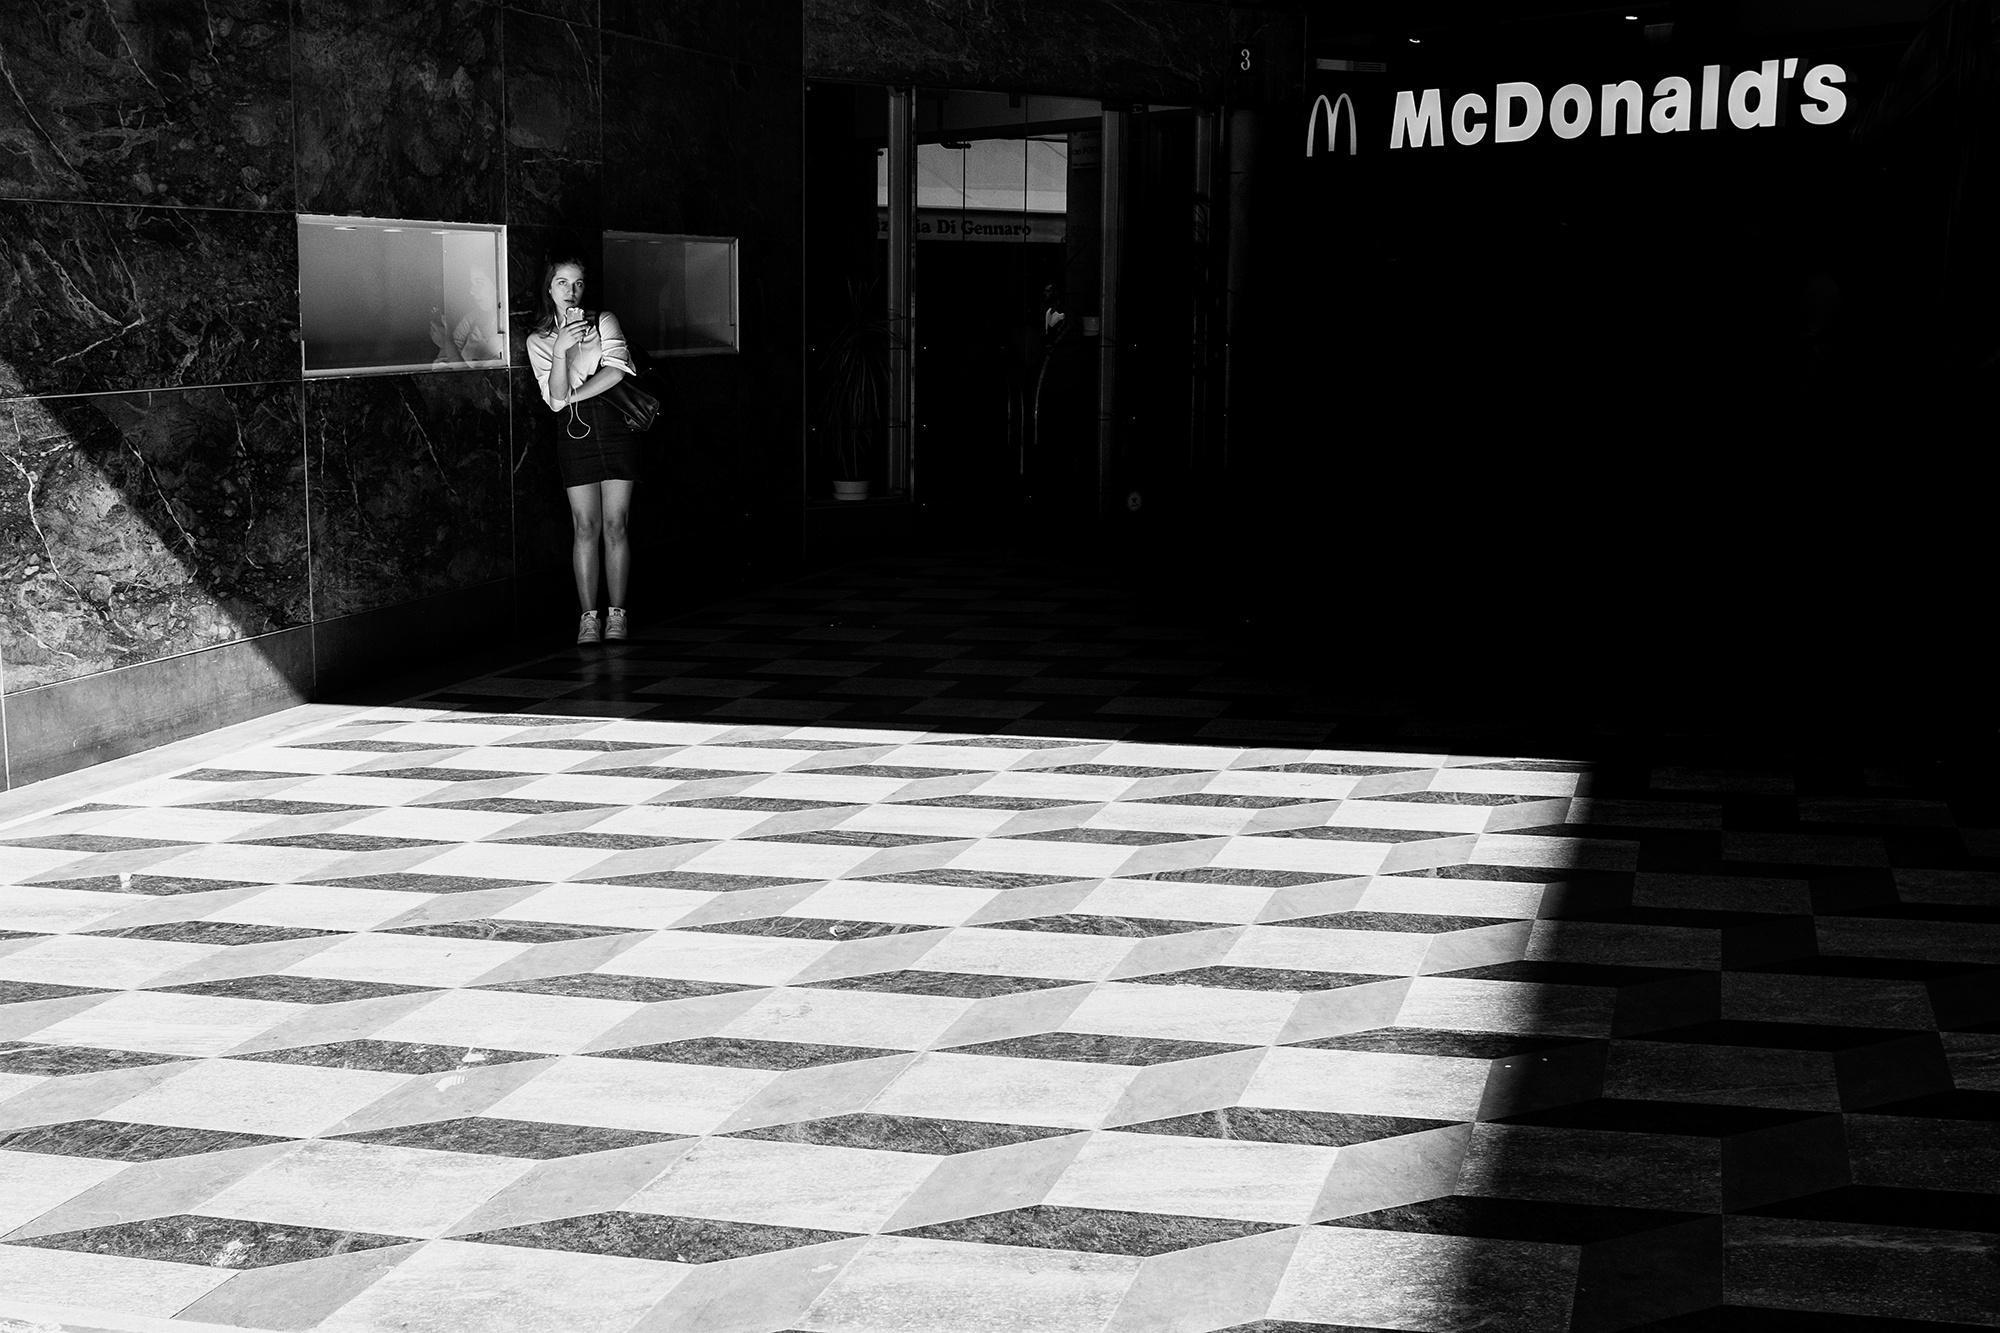 untitled by Giulio Annibali